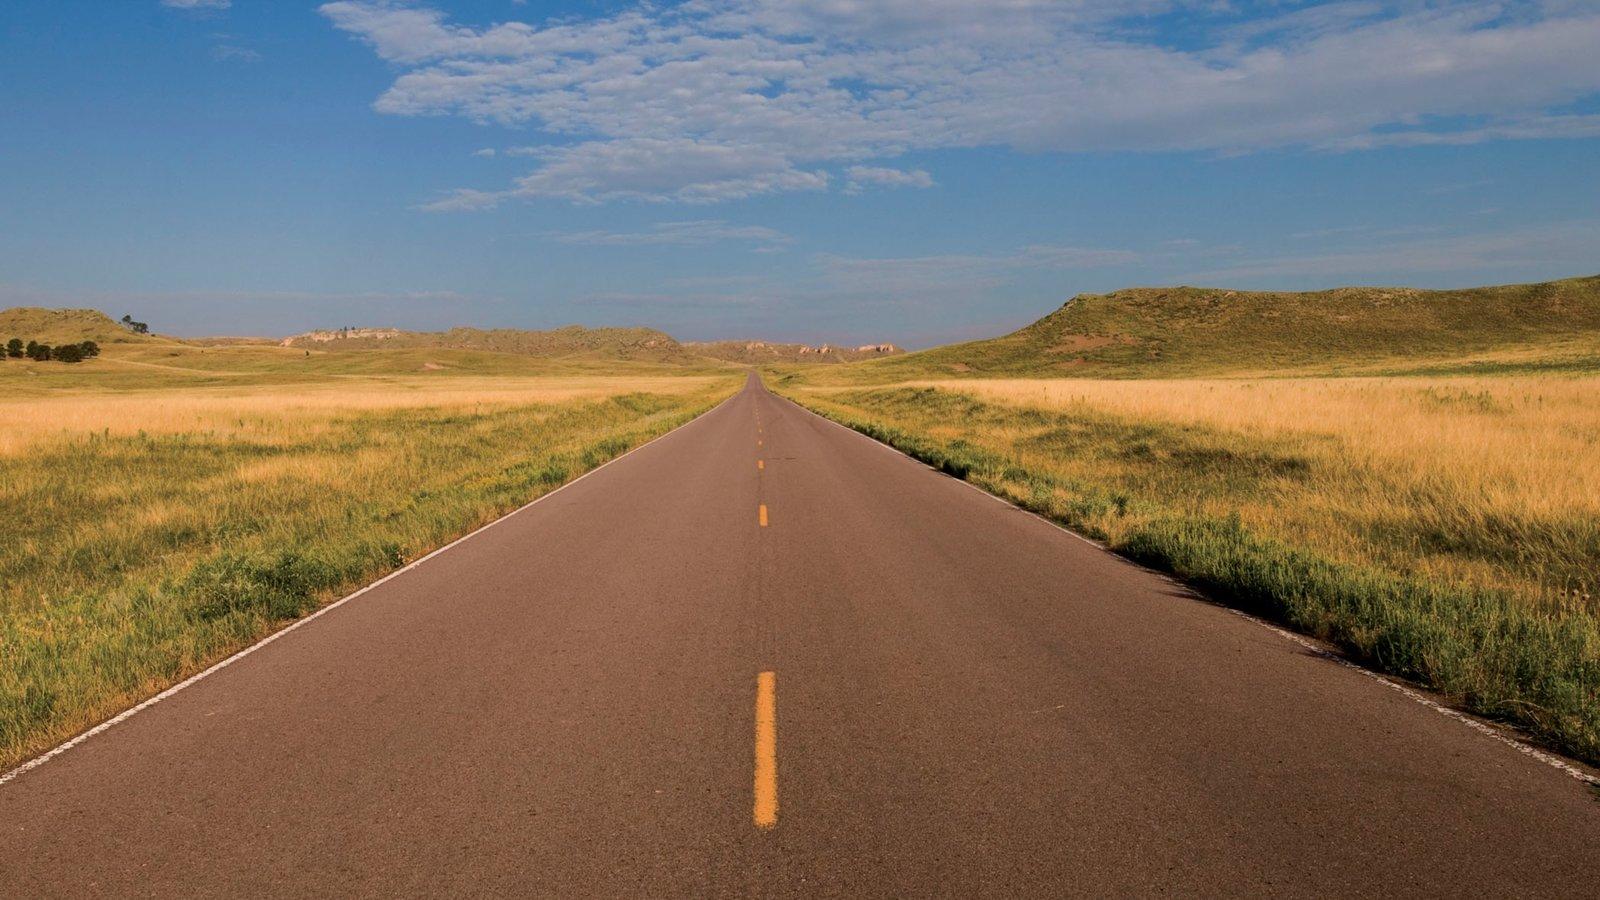 Landscape Pictures: View Images of Eastern Nebraska